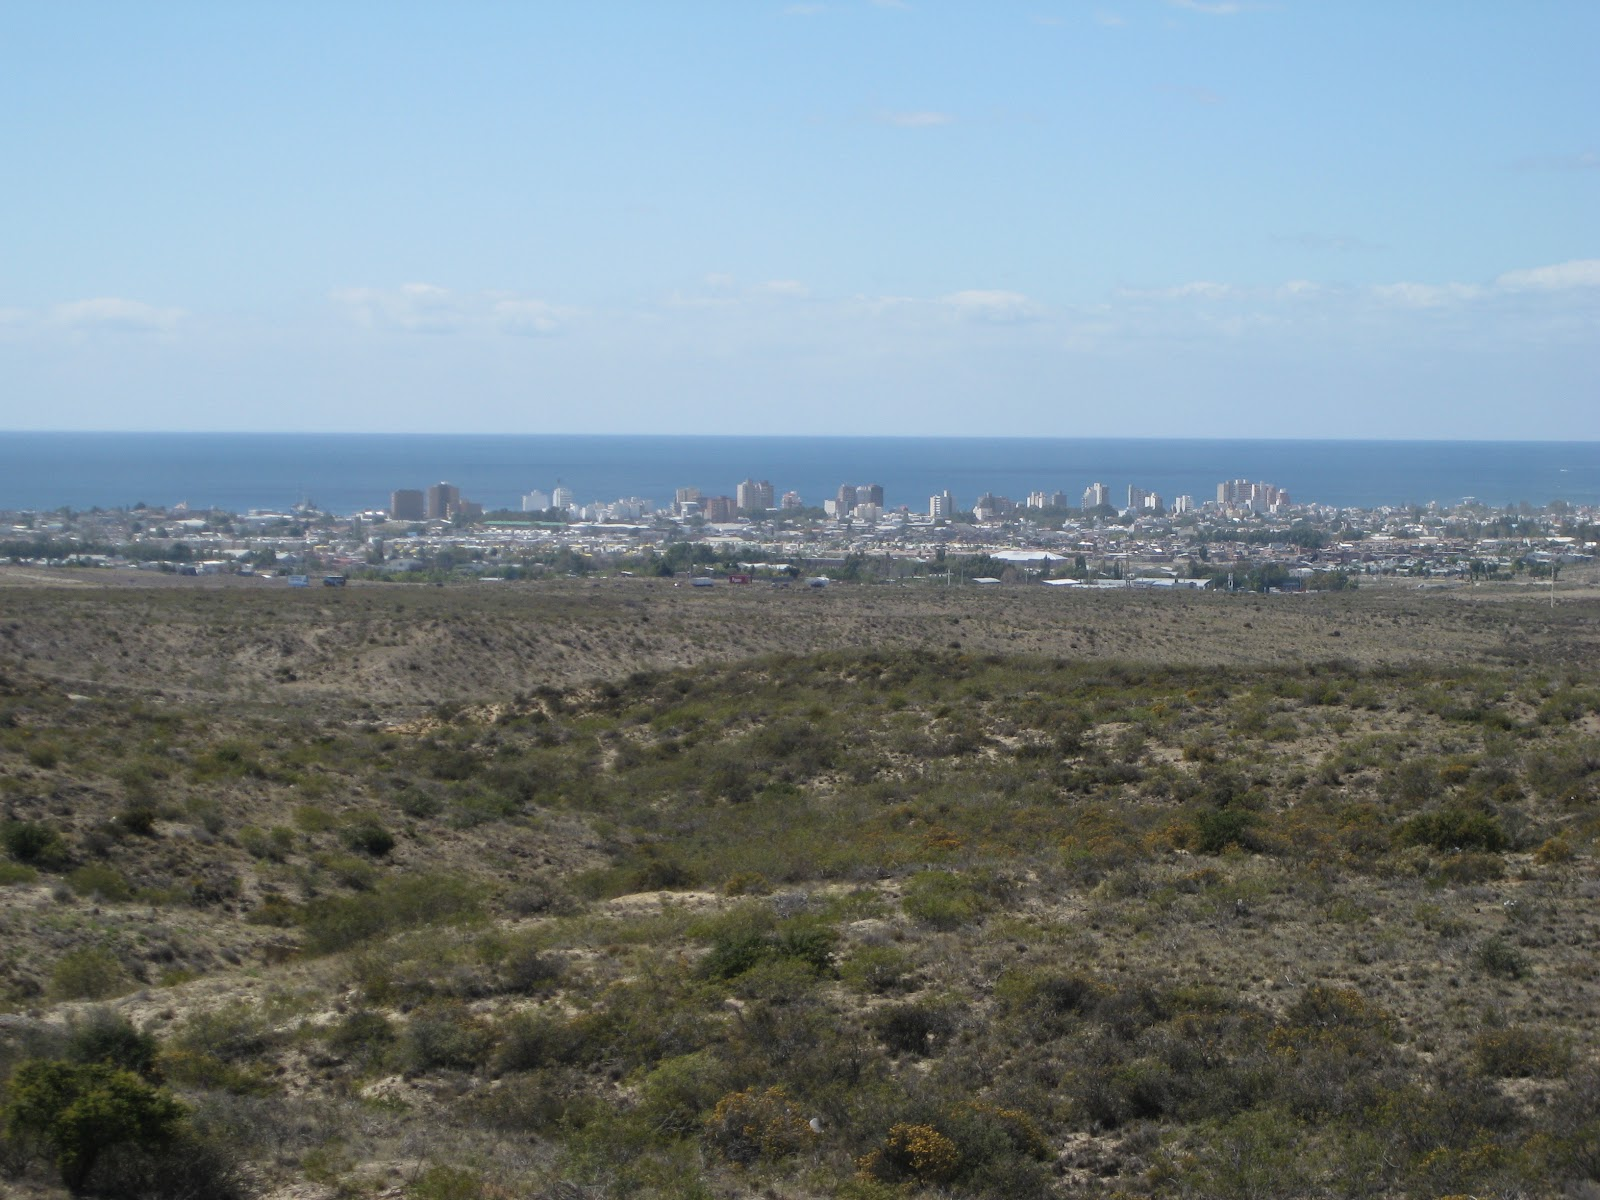 Looking down towards Puerto Madryn